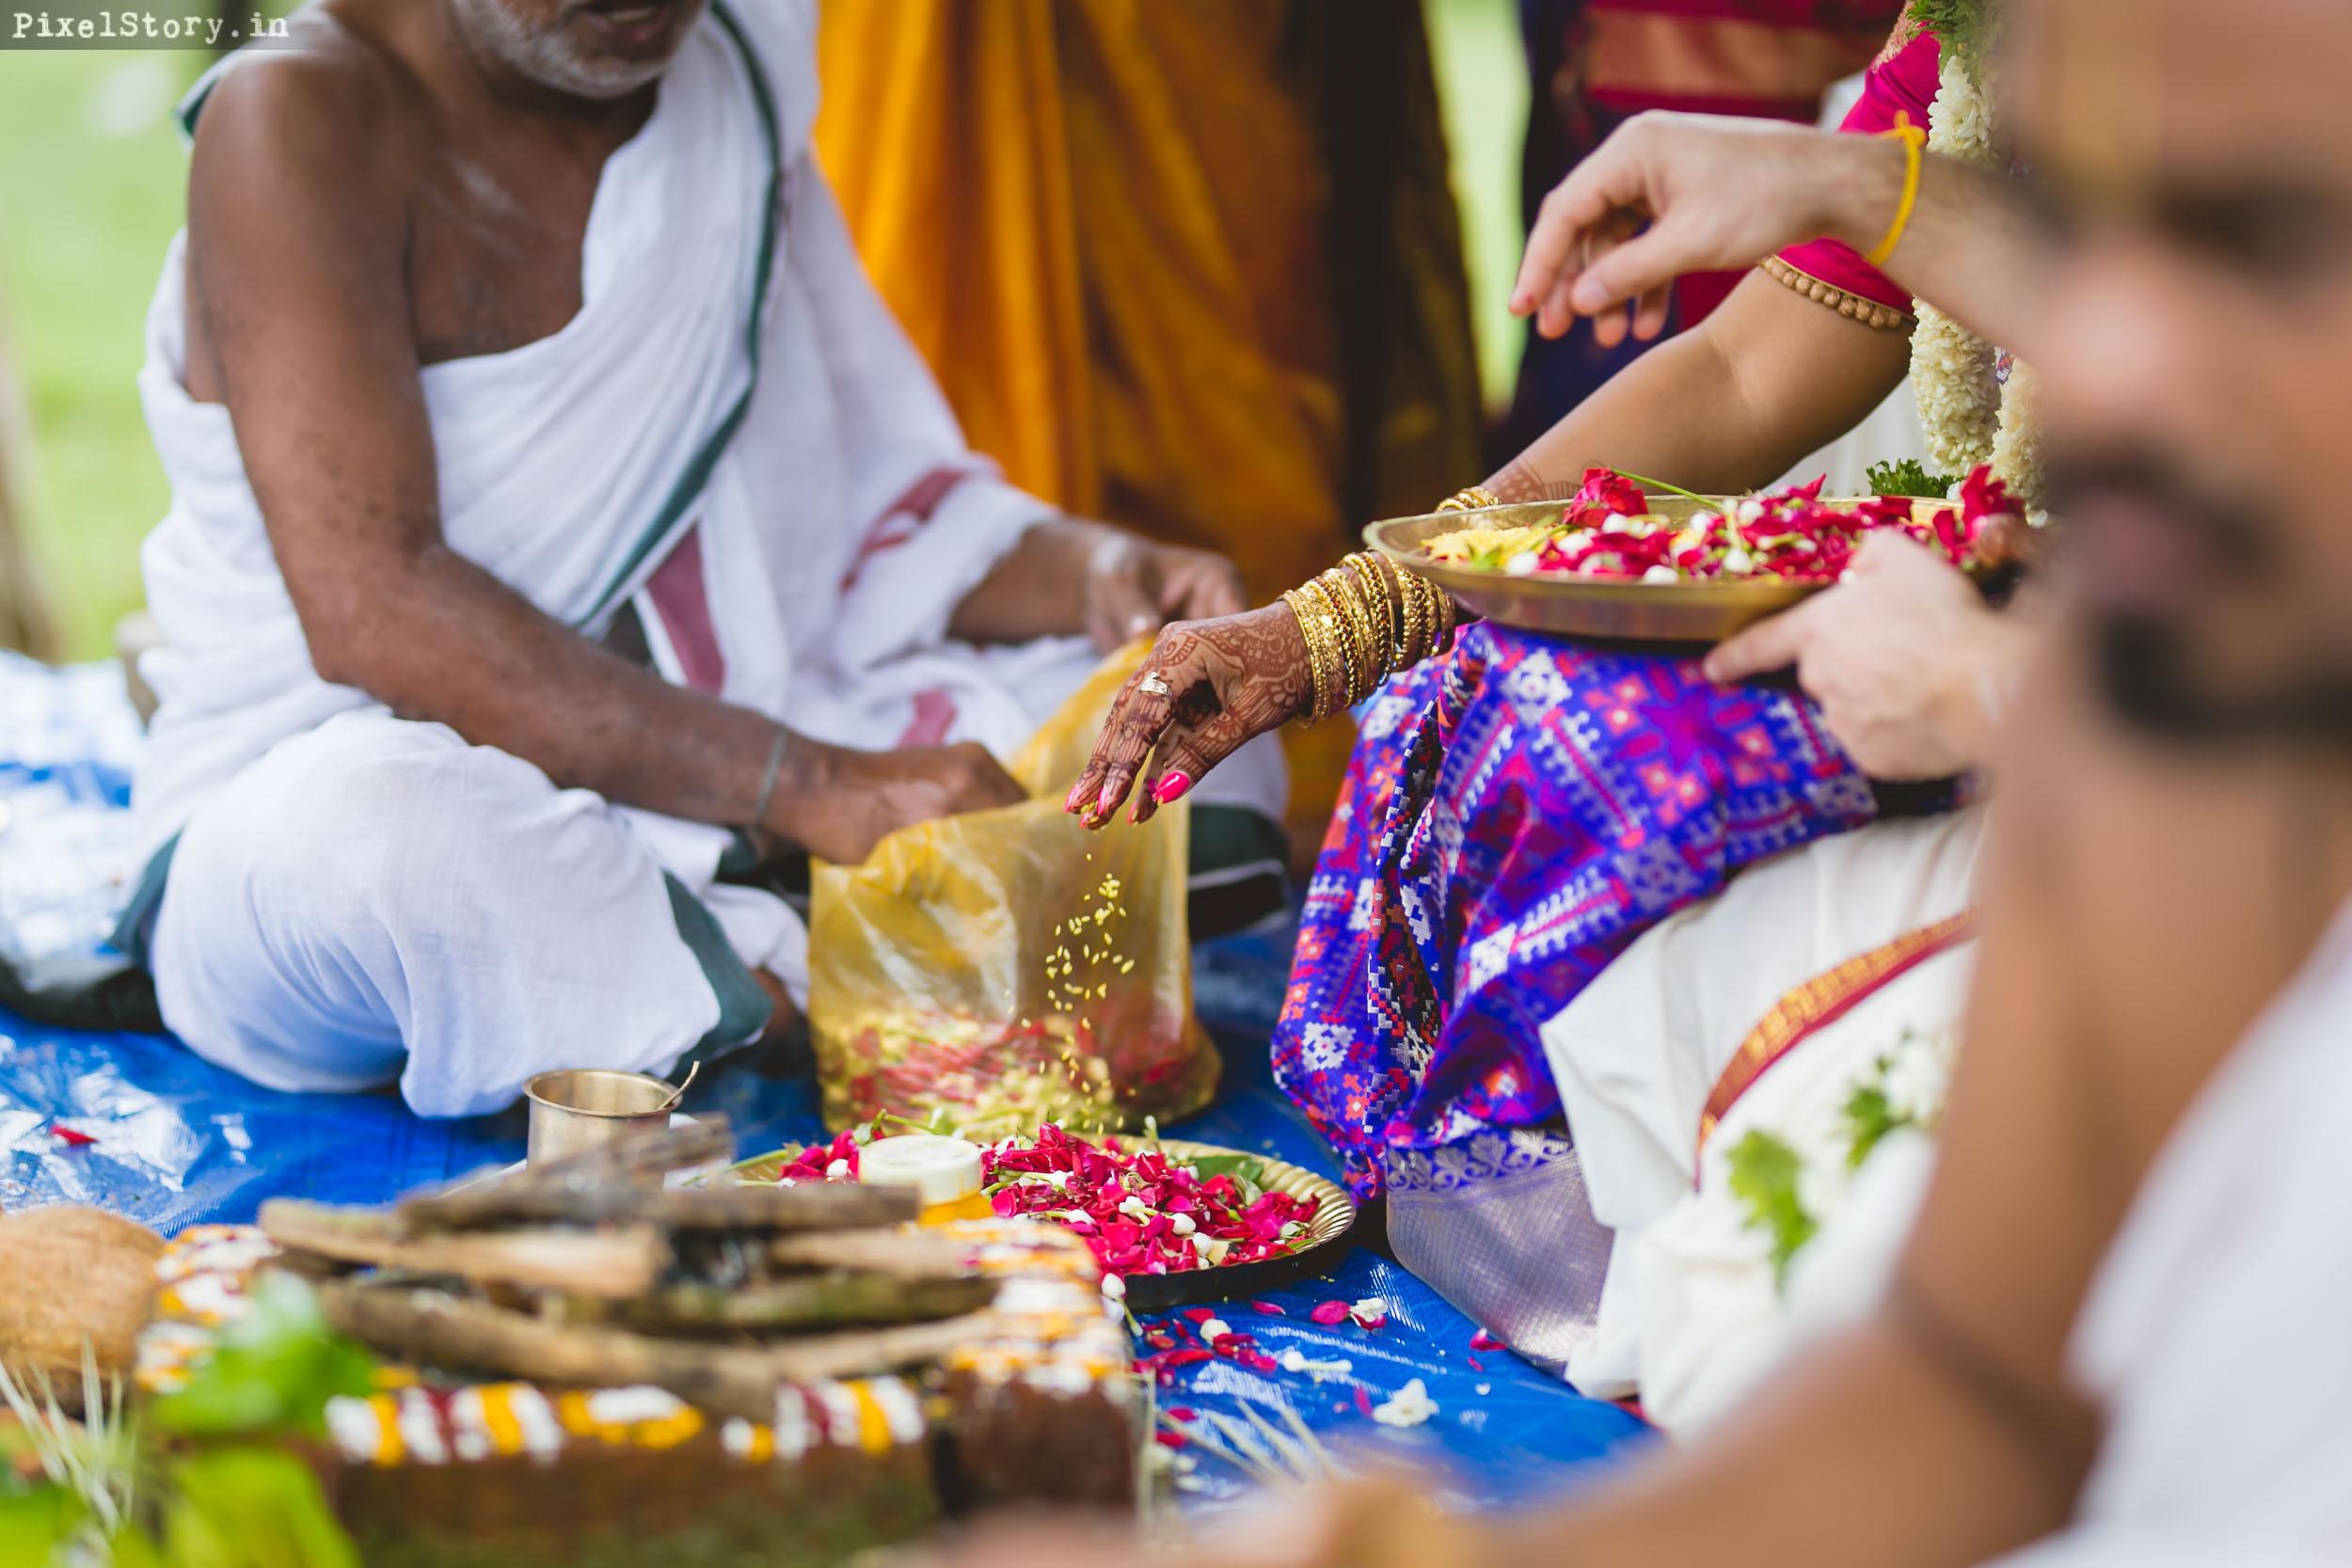 PixelStory-Jungle-Wedding-Photographer-Masinagudi-Indo-French059.jpg